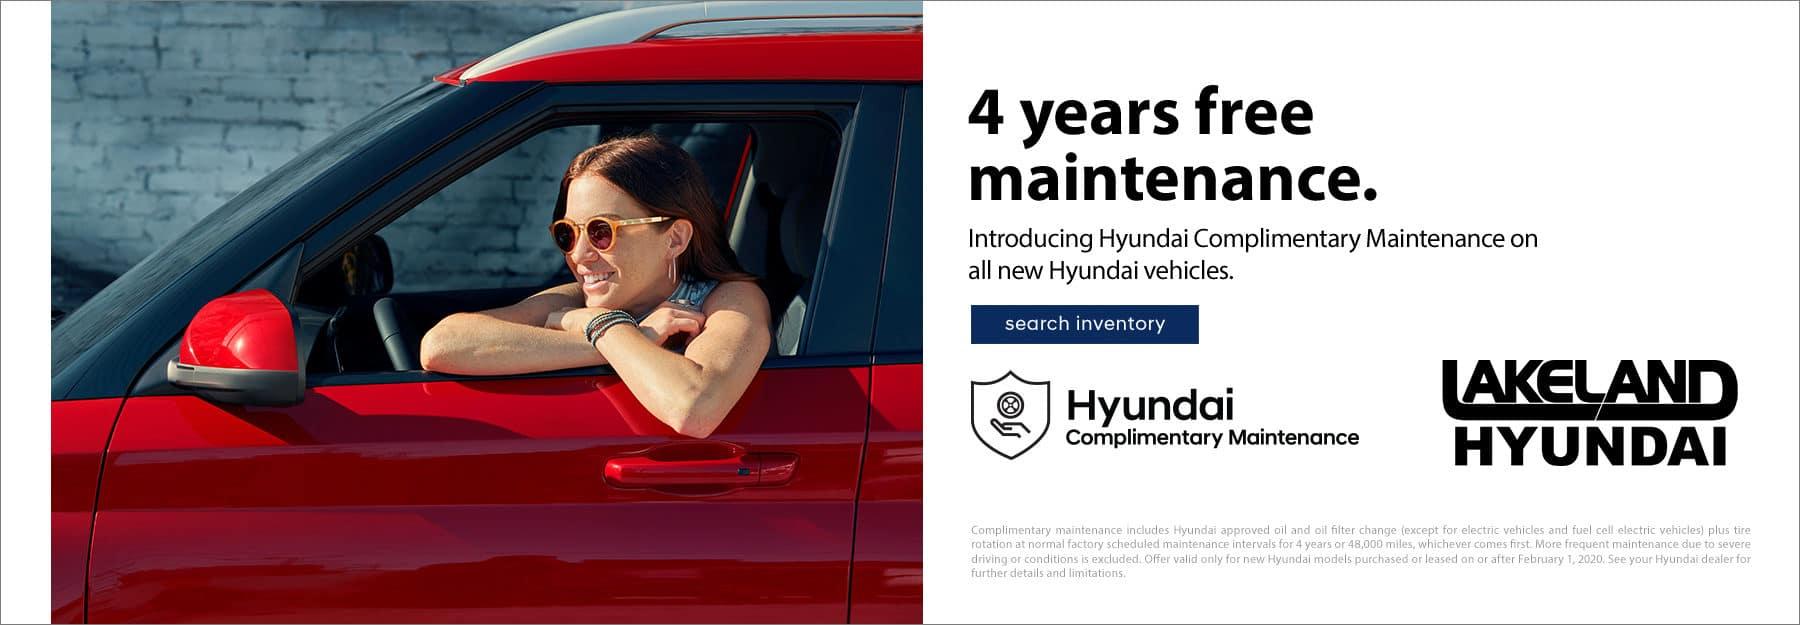 4 Years Complimenatary Maintenance at Lakeland Hyundai